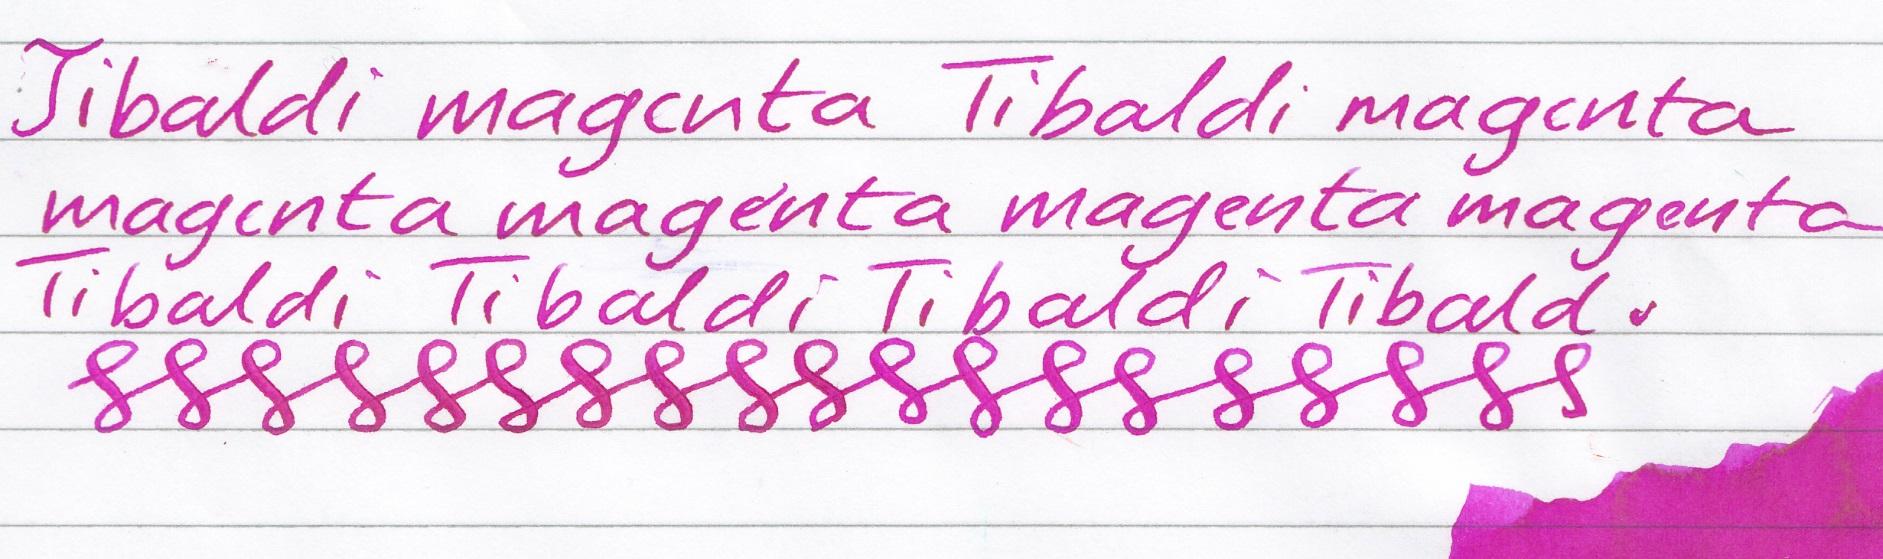 fpn_1458075693__magenta_tibaldi_lyreco_2